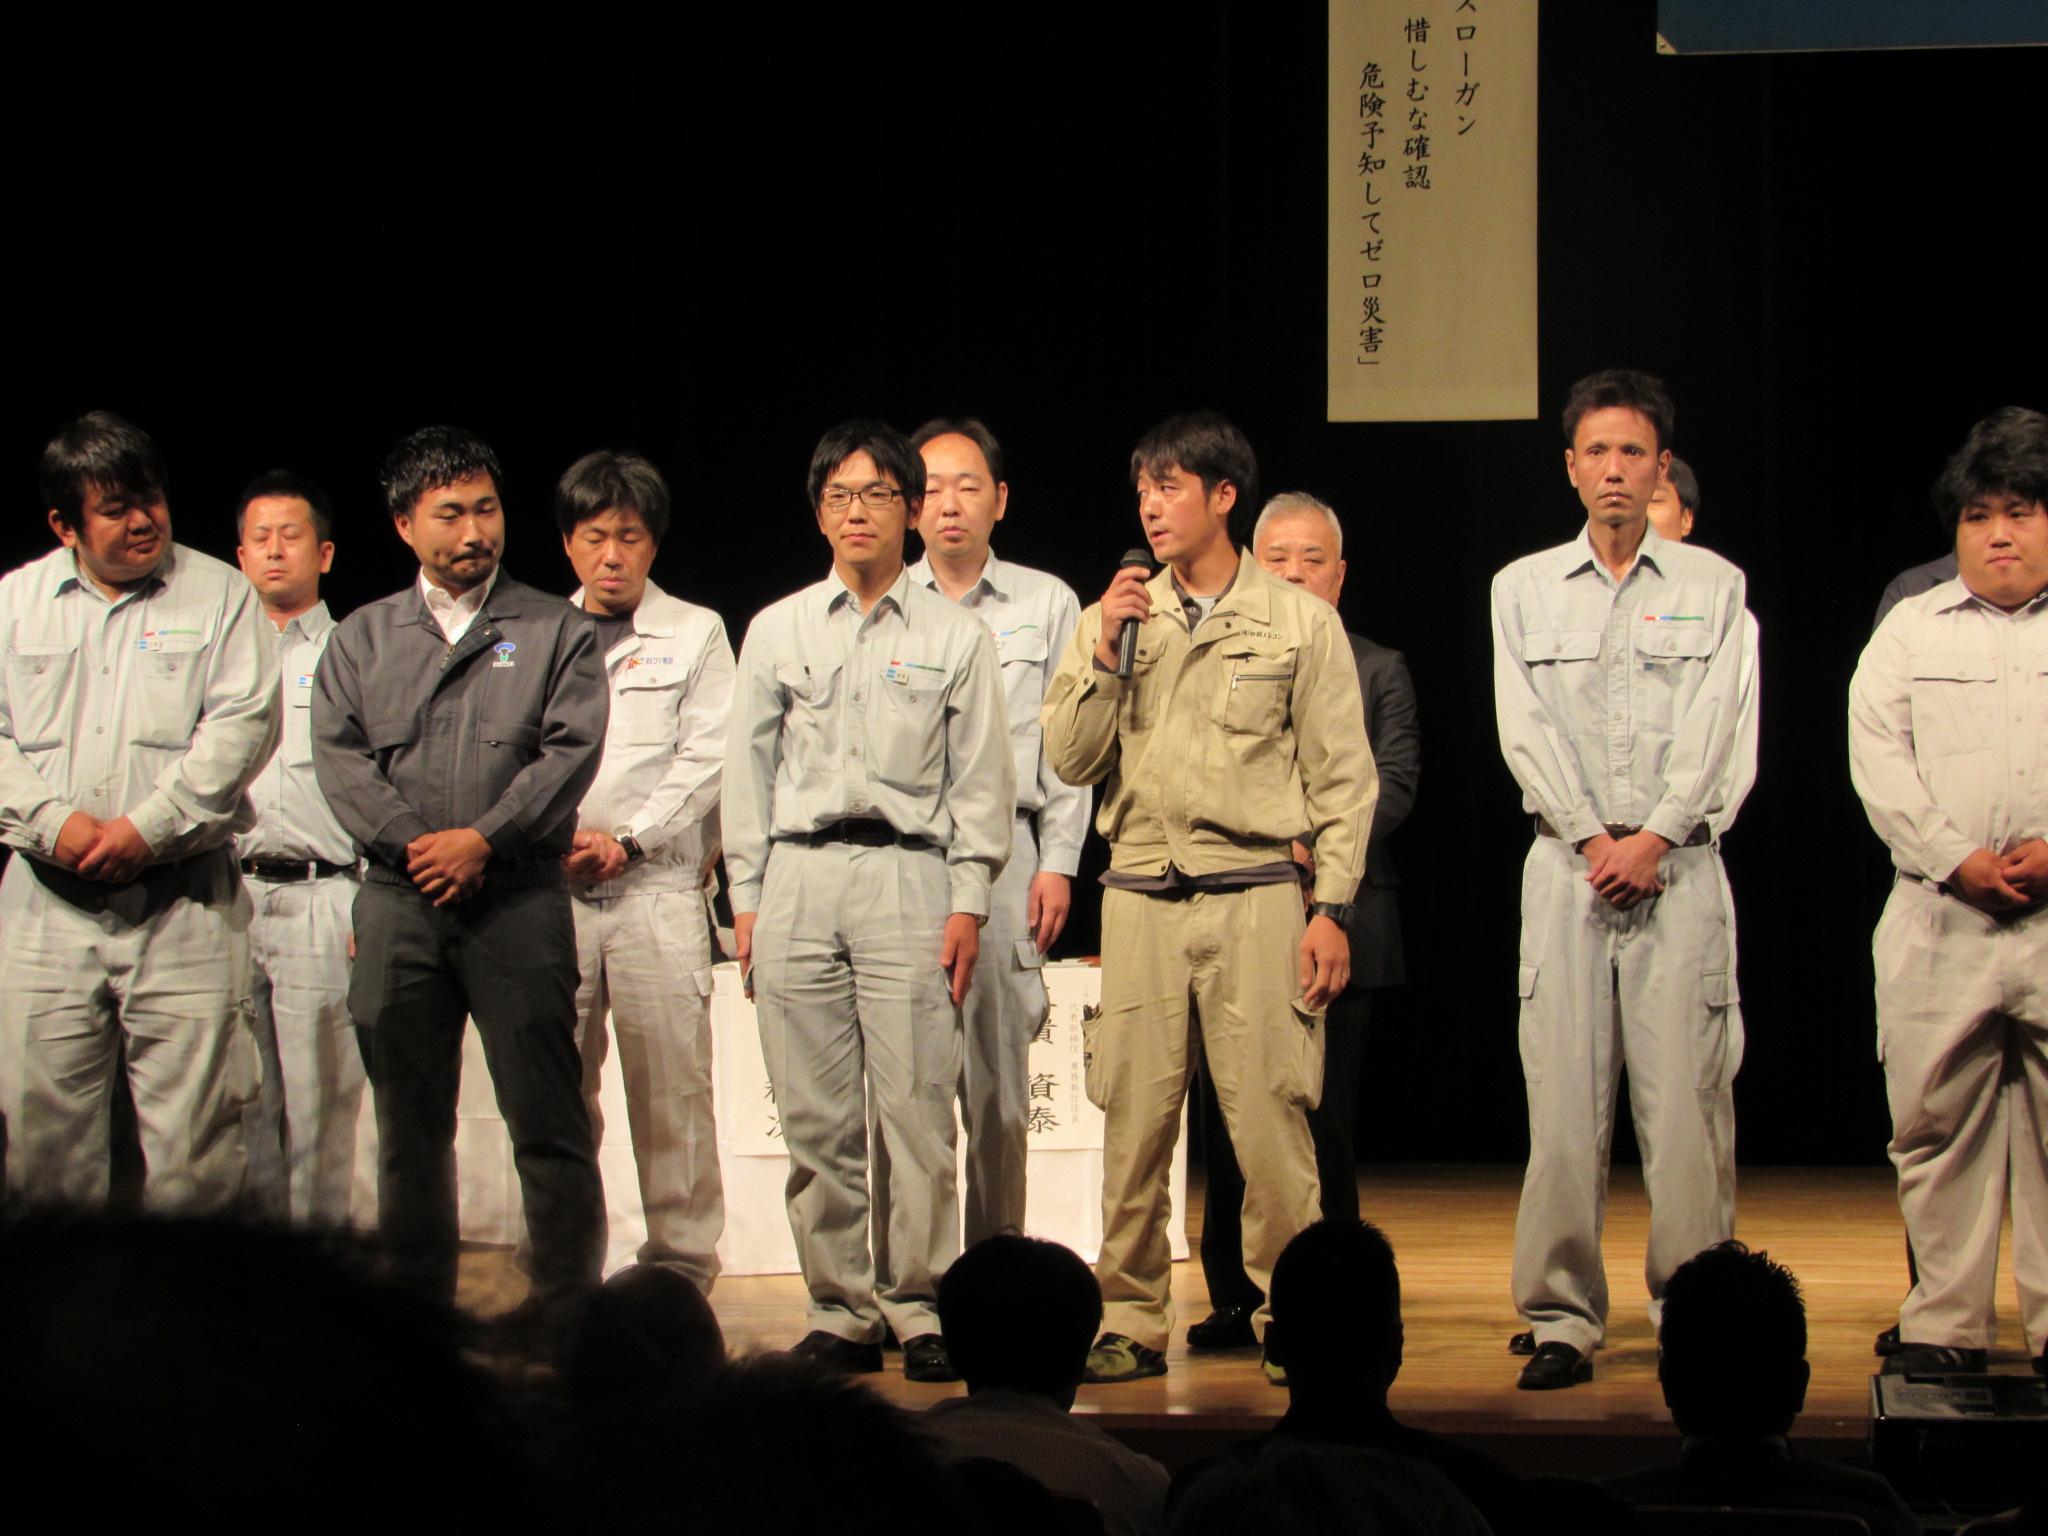 http://shikoku.misawa.co.jp/blg_ms/IMG_7891.JPG